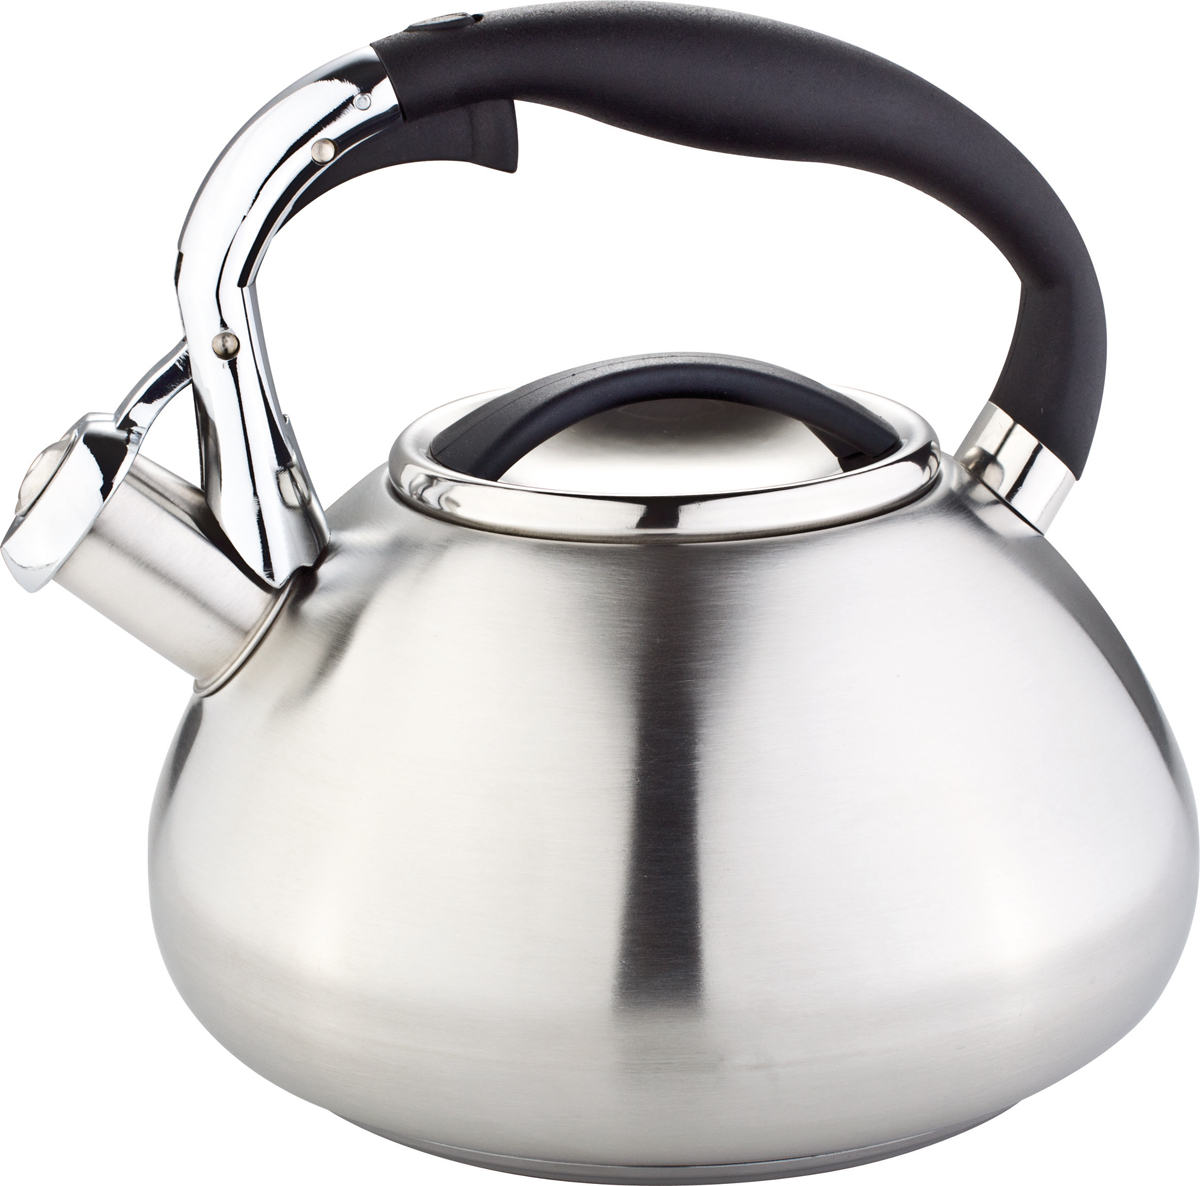 Чайник Rainstahl, со свистком, цвет: серебристый, 3 л. 7602-30RS\WK riess чайник со свистком pastell 2 л 0543 015 rosa riess